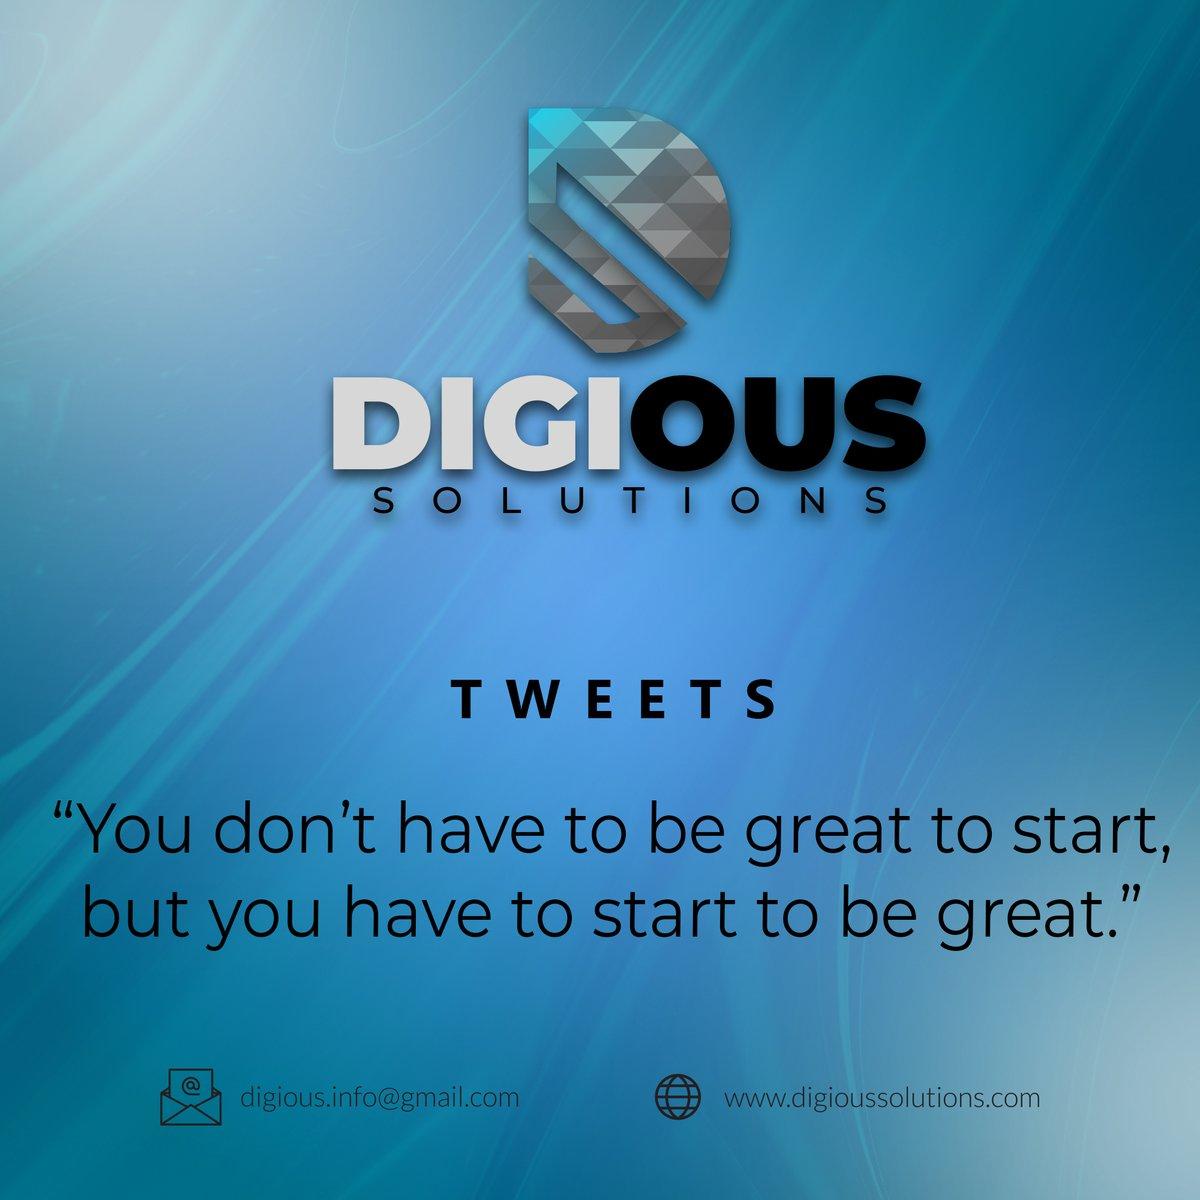 """You don't have to be great to start, but you have to start to be great."" #Entrepreneur #businessowner #startup #DigitalMarketing #socialmedia #Website #searchengineoptimization #SMM #ecommerce #ecommercetips #Kobe #Gigi #By2025 #tuesdayvibe #verizon @maideng_rts @ScrimFinder"